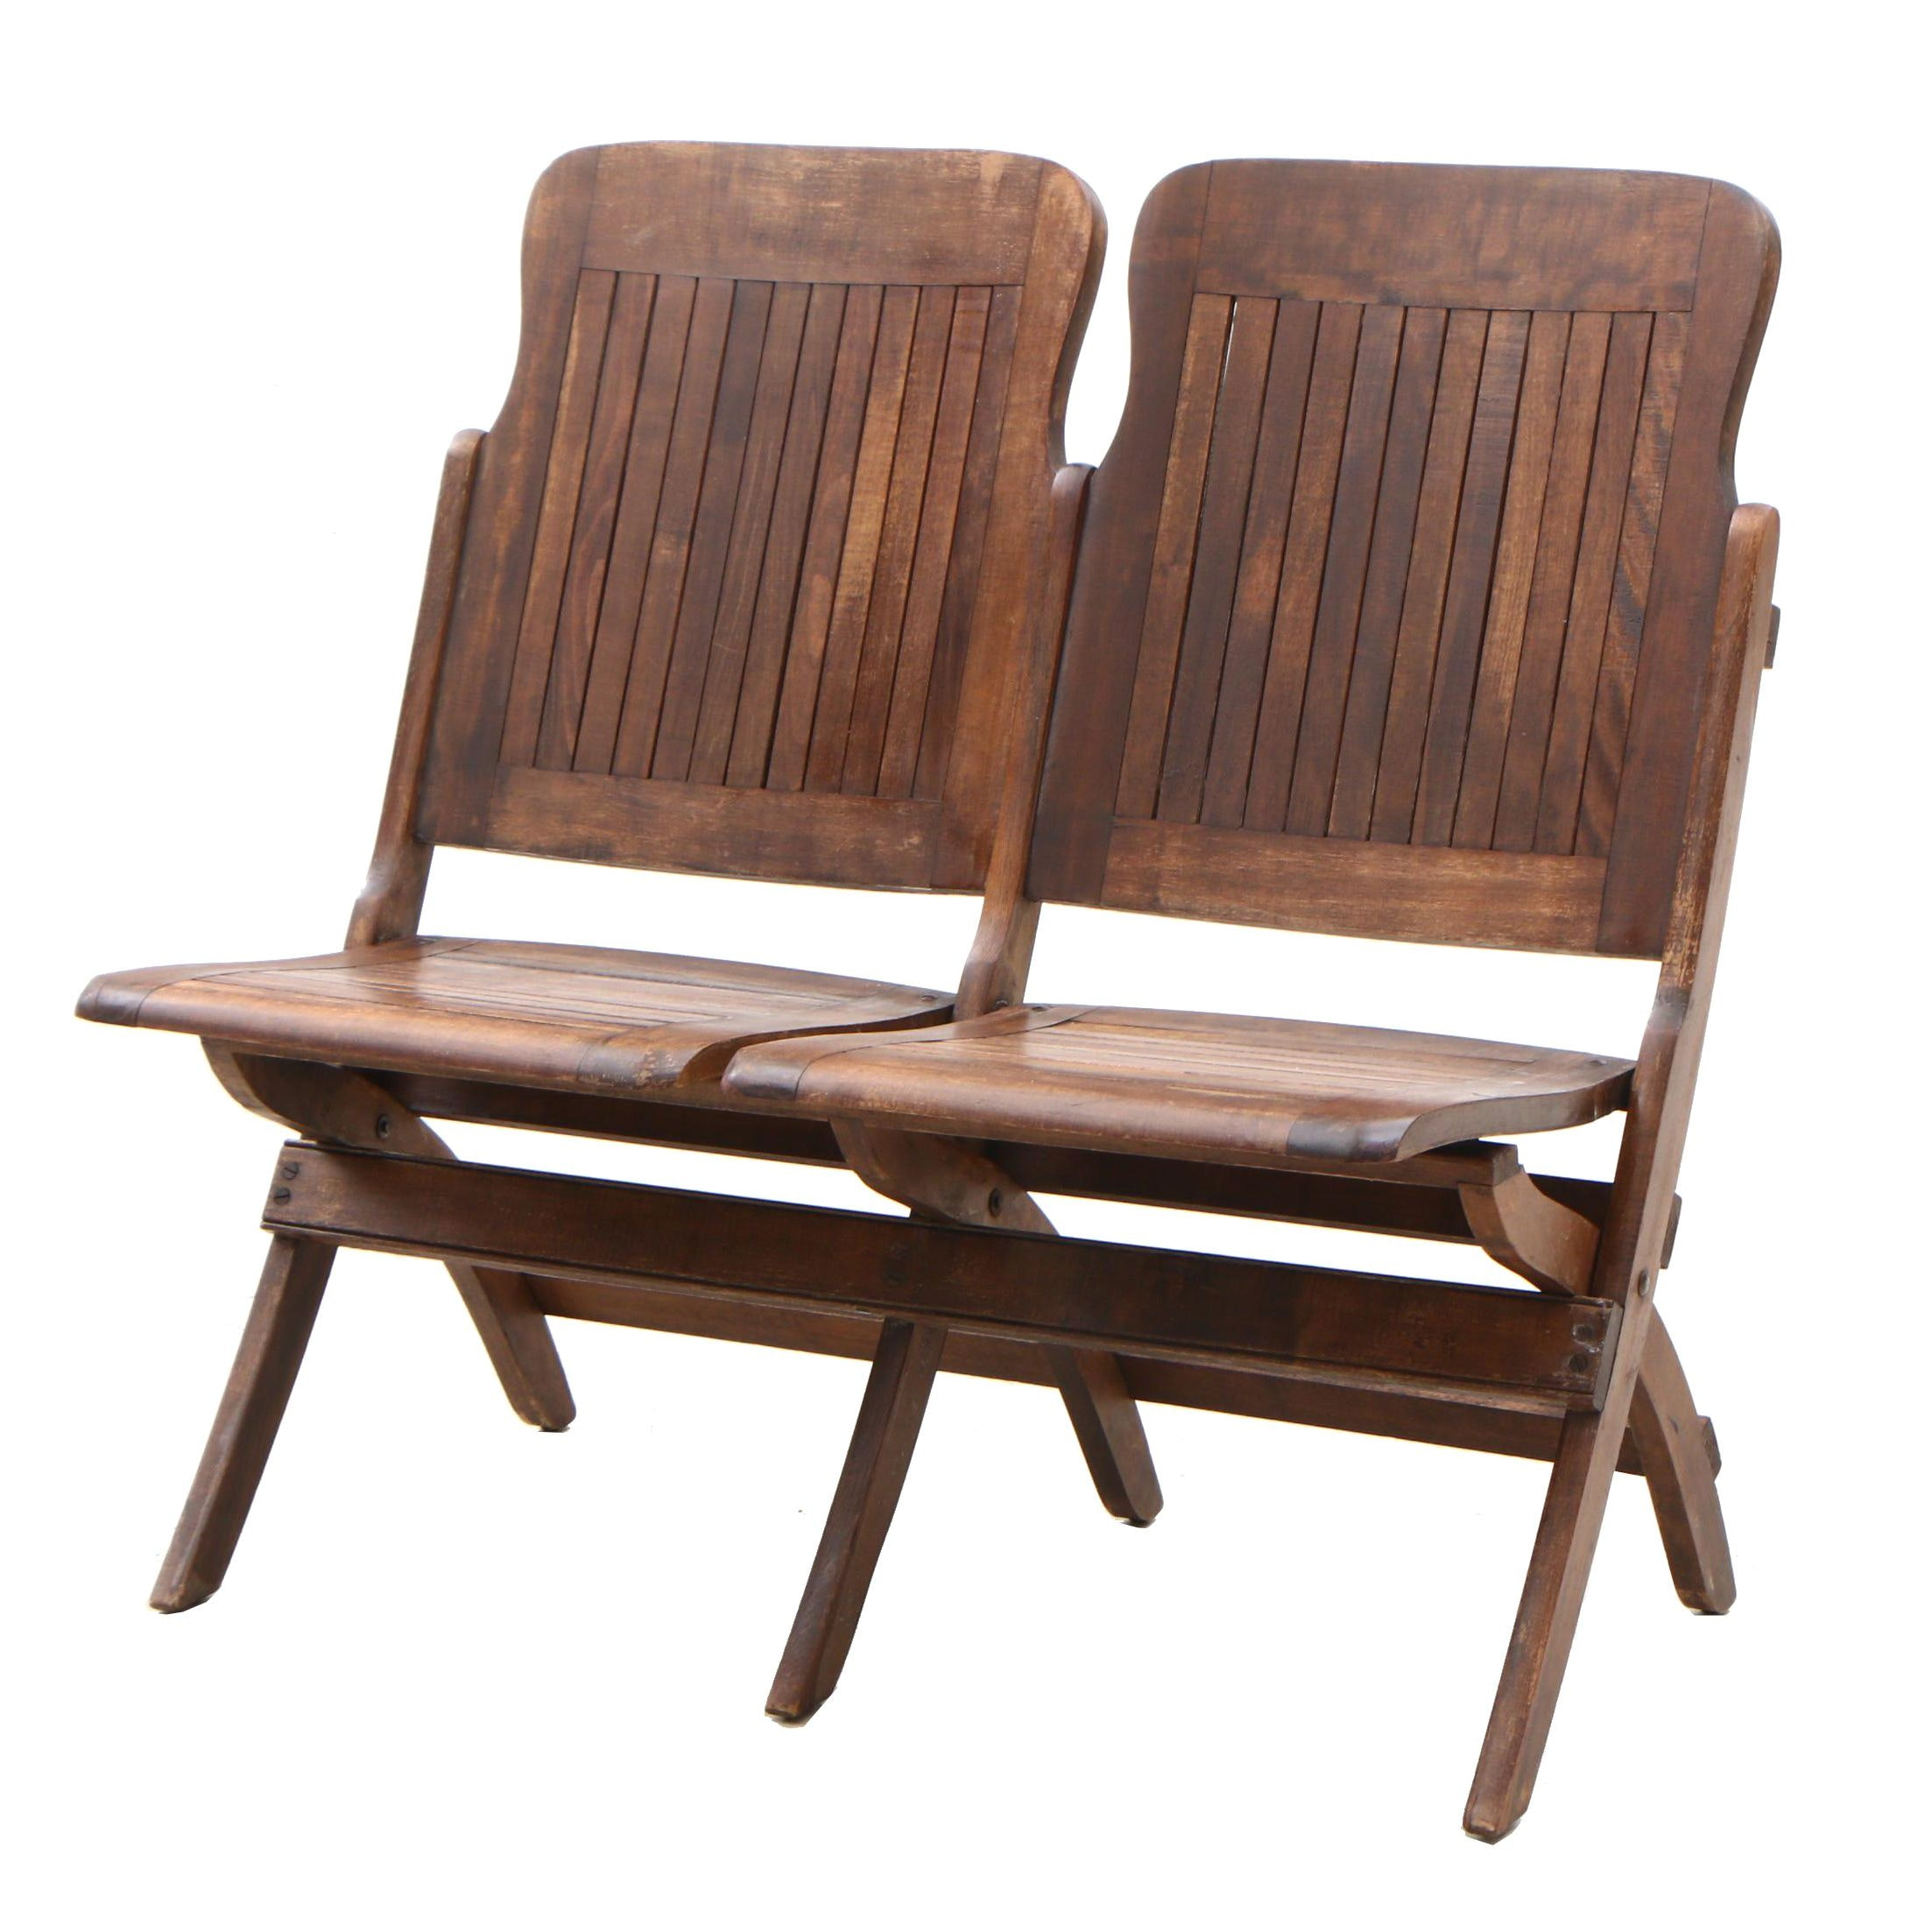 Heywood-Wakefield Folding Seats, circa 1930s